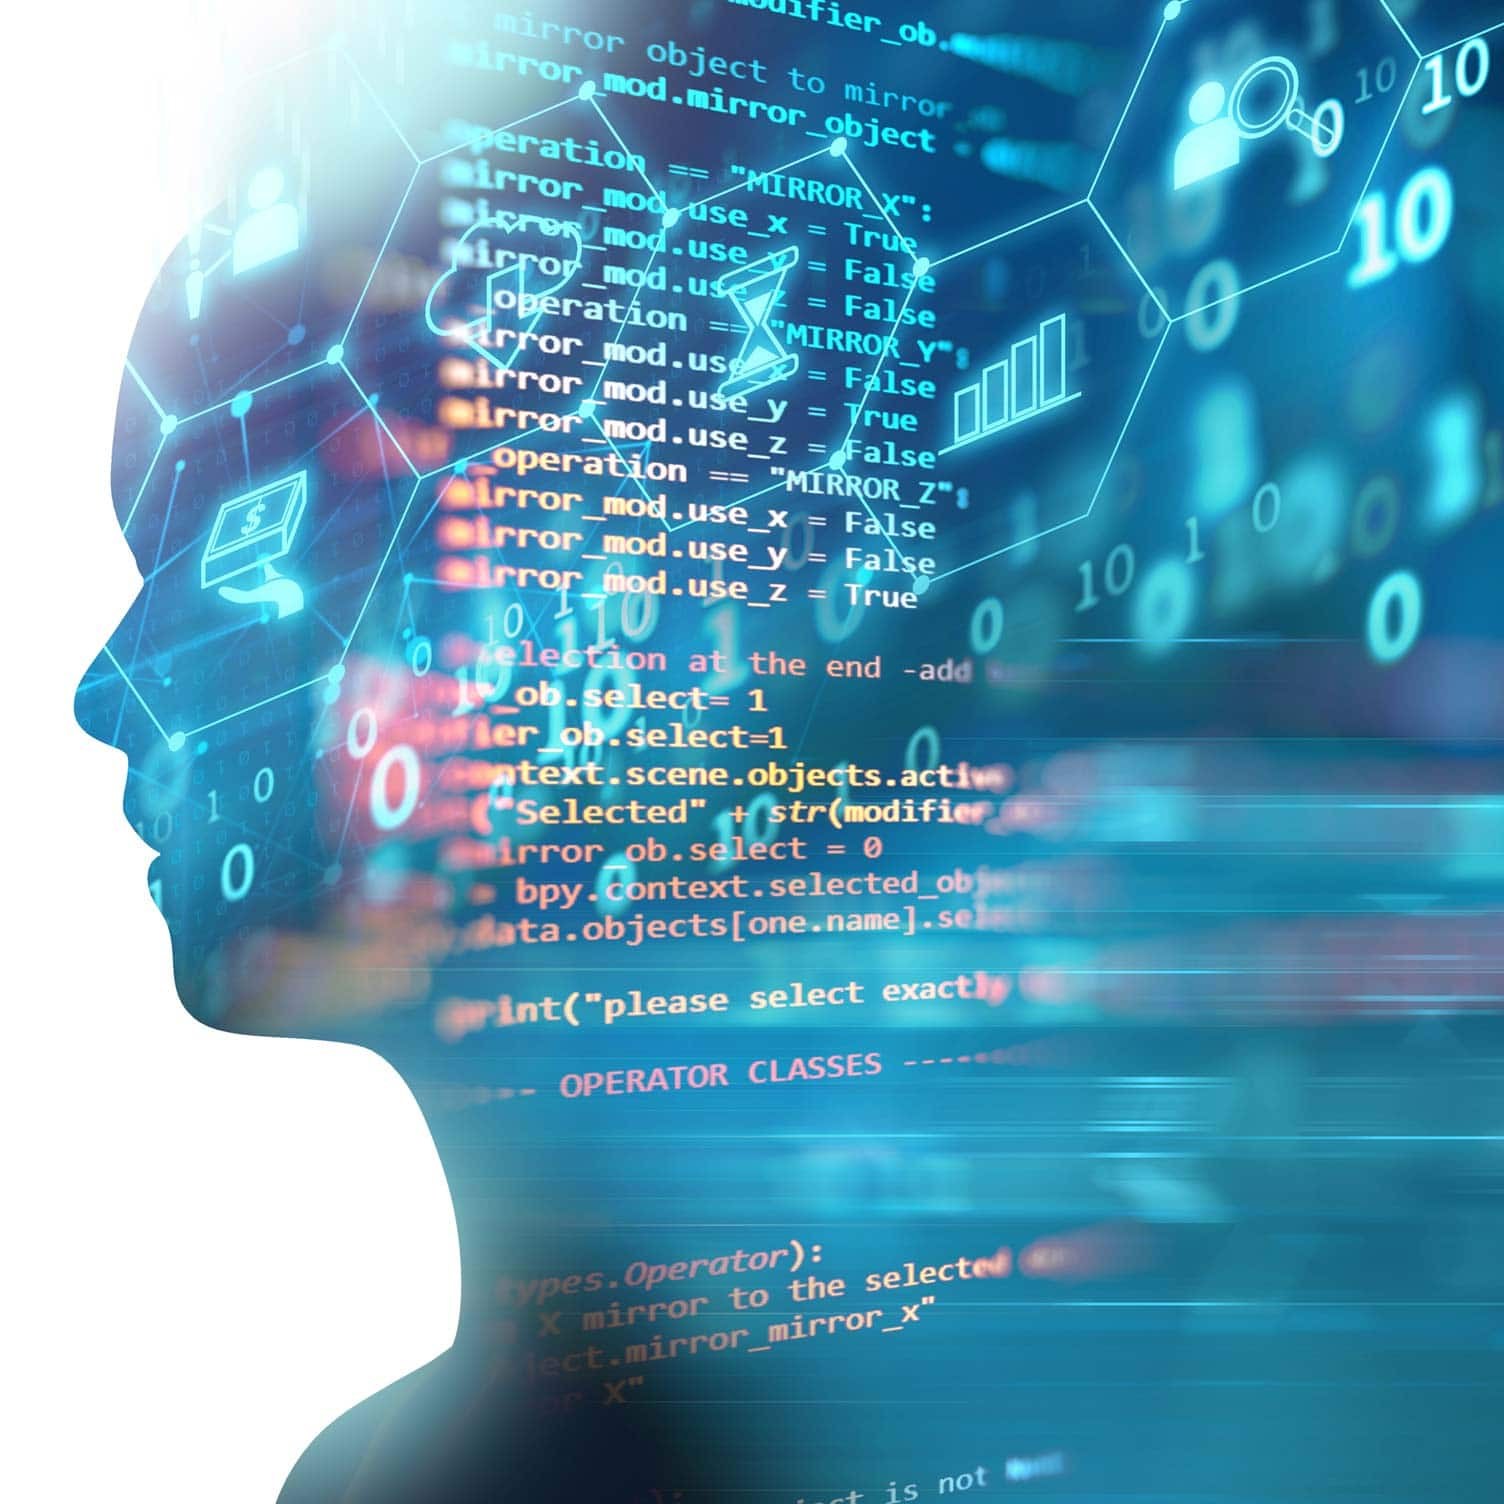 https://www.capventis.com/wp-content/uploads/2019/12/data-science-business-analytics-square.jpg